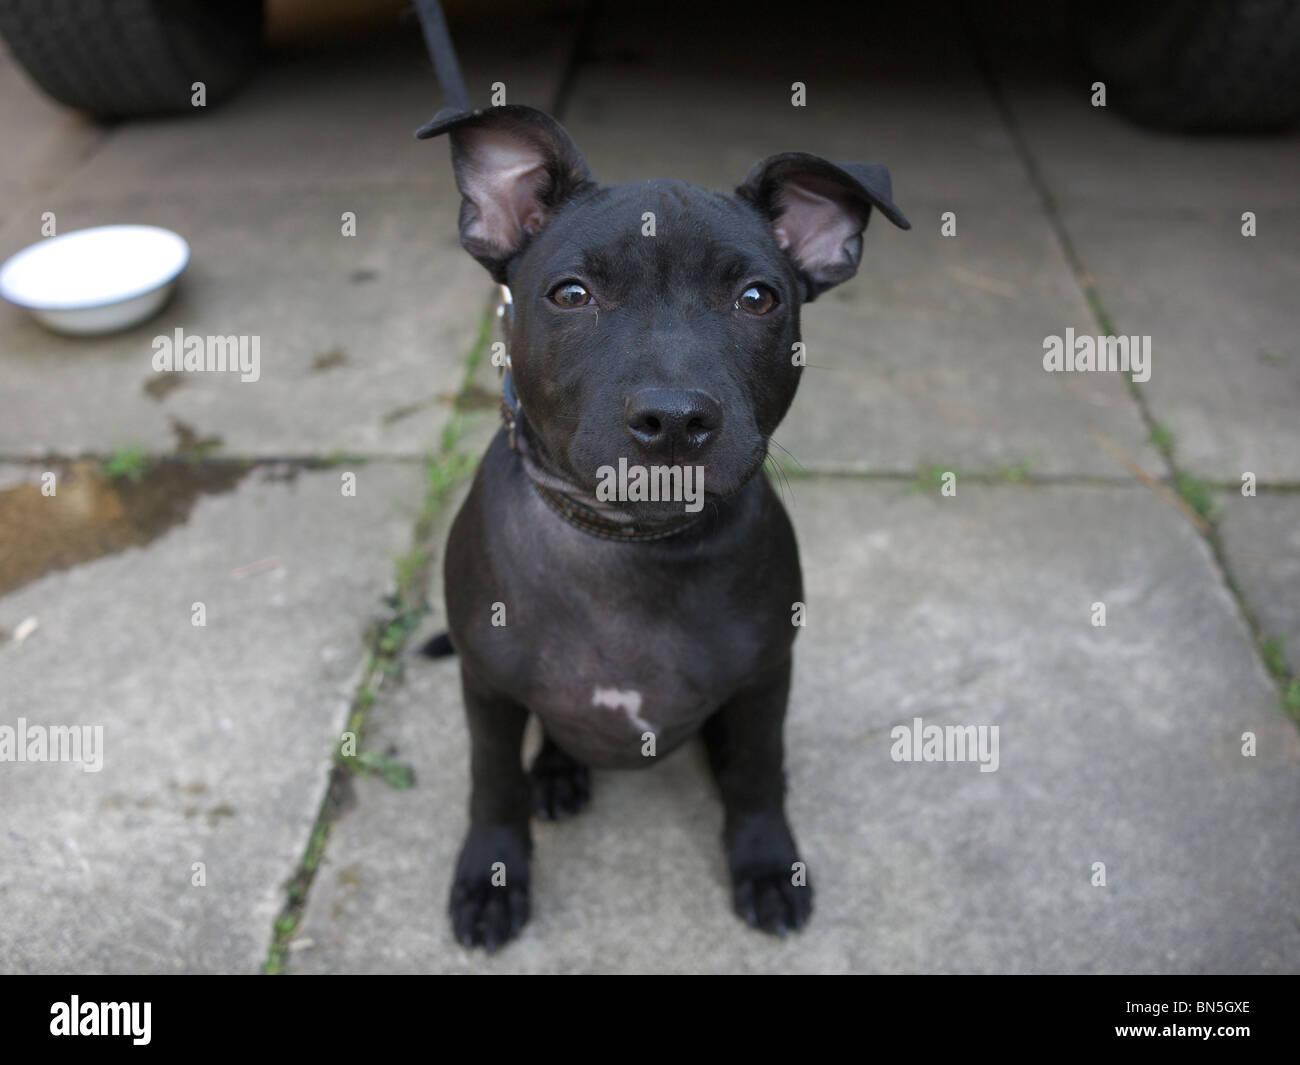 Staffordshire Bull Terrier pup. England, UK. - Stock Image